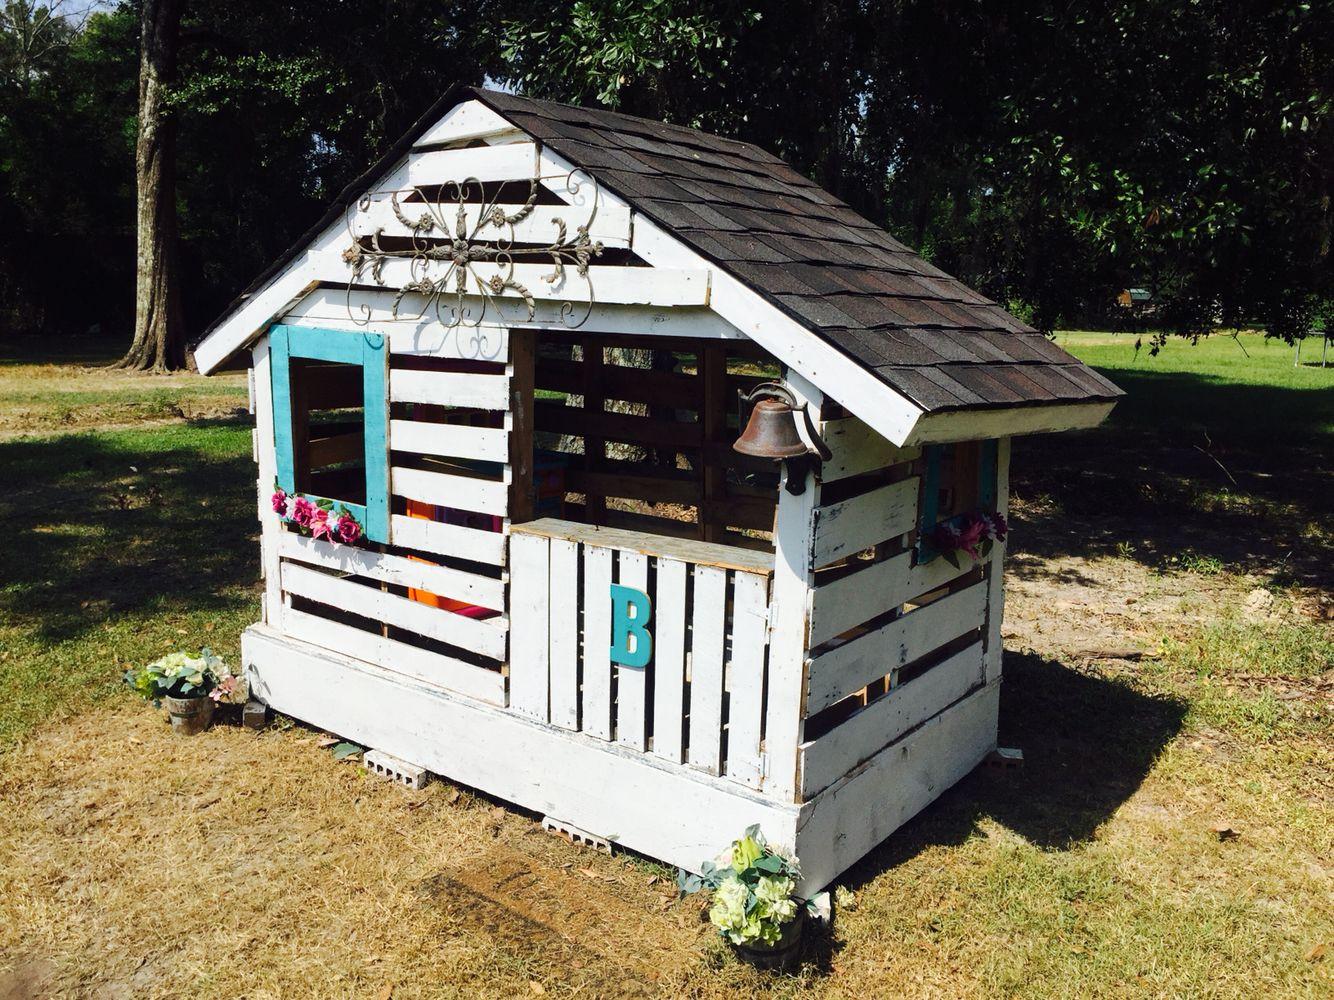 Best ideas about DIY Pallet Playhouse Plans . Save or Pin Pallet playhouse Play houses in 2019 Now.